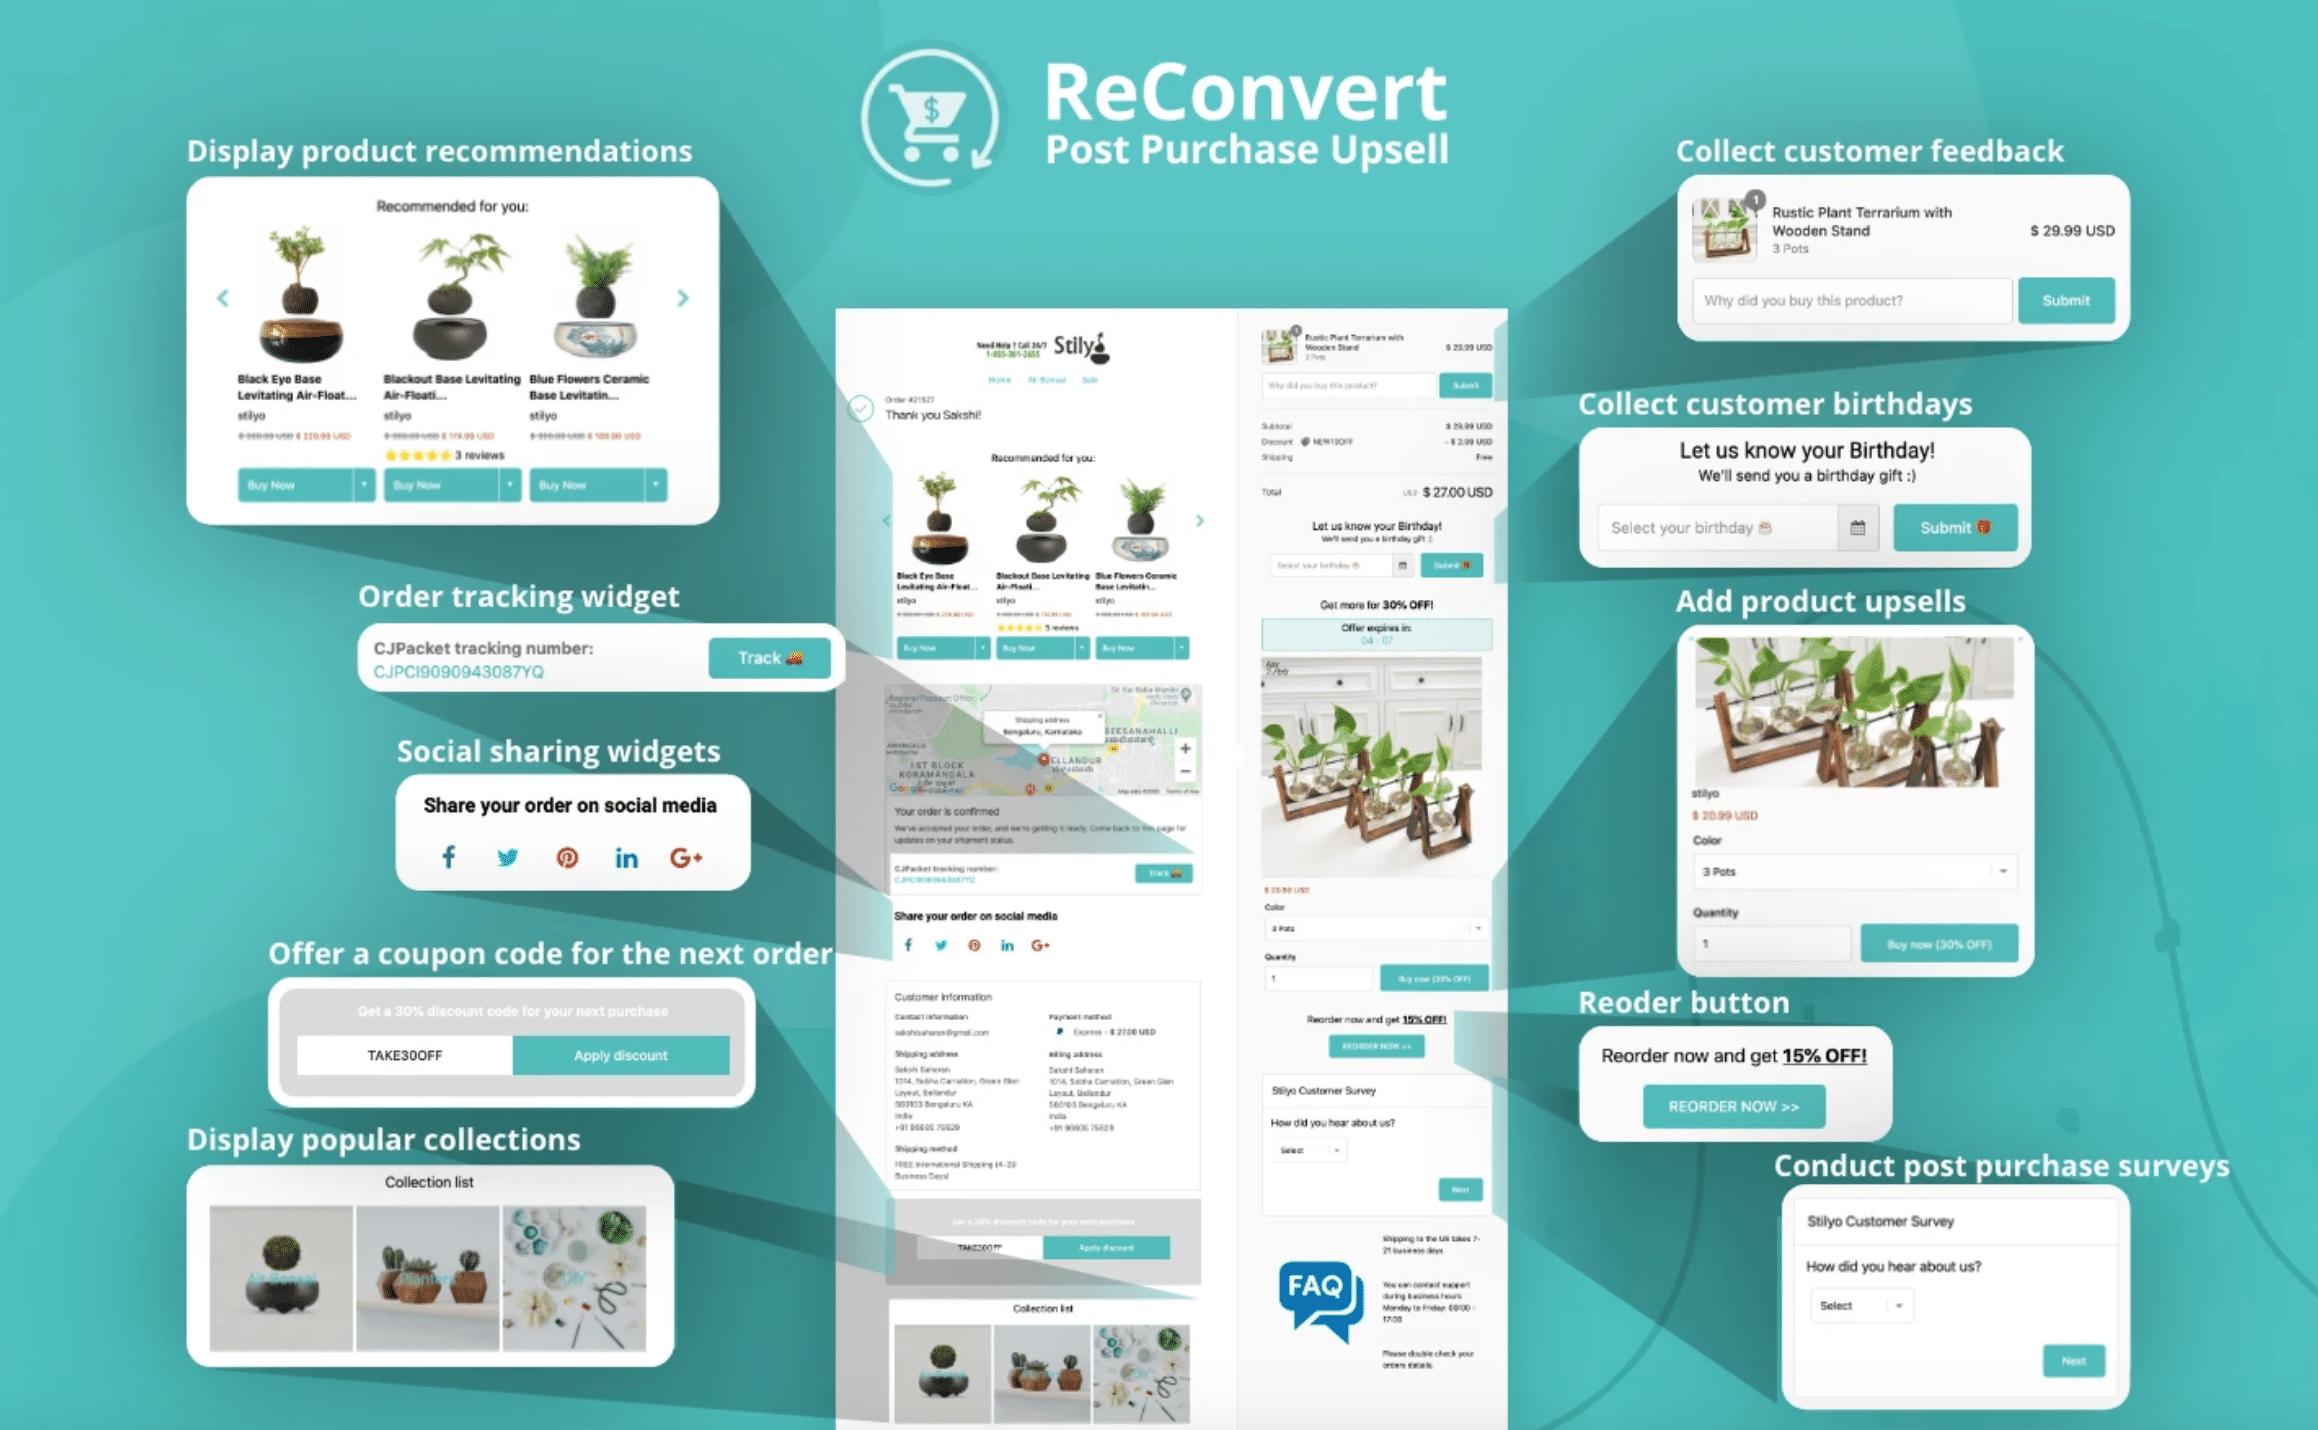 ReConvert Product Description